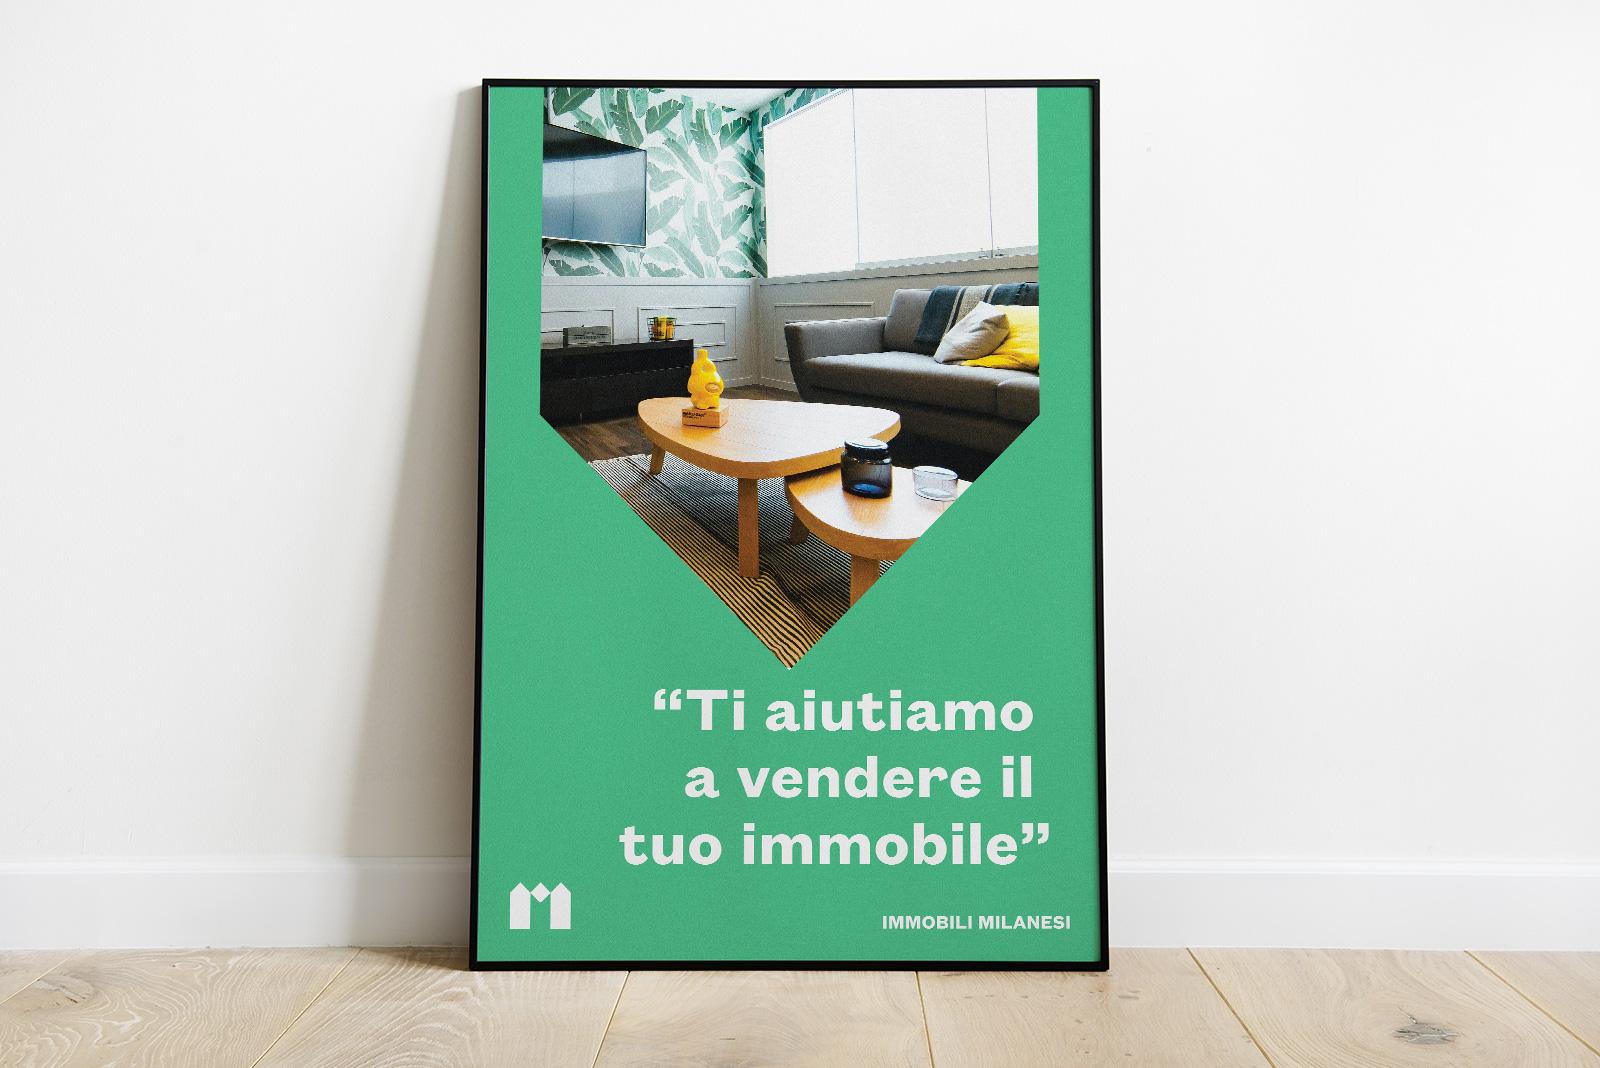 immobili-milanesi-poster